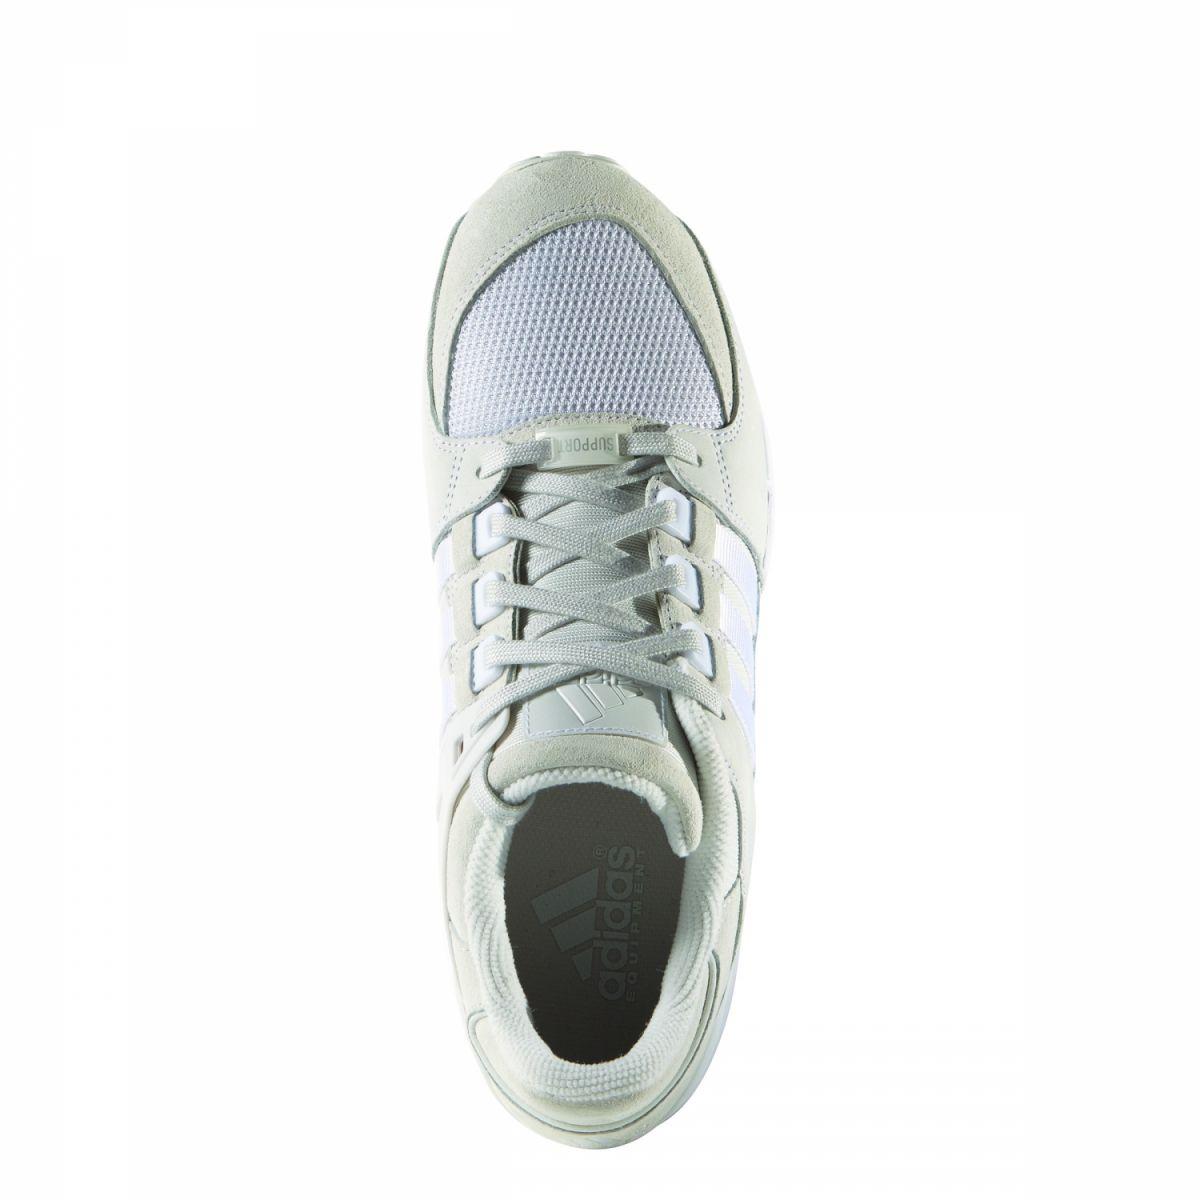 adidas originals equipment running support herren sneaker. Black Bedroom Furniture Sets. Home Design Ideas